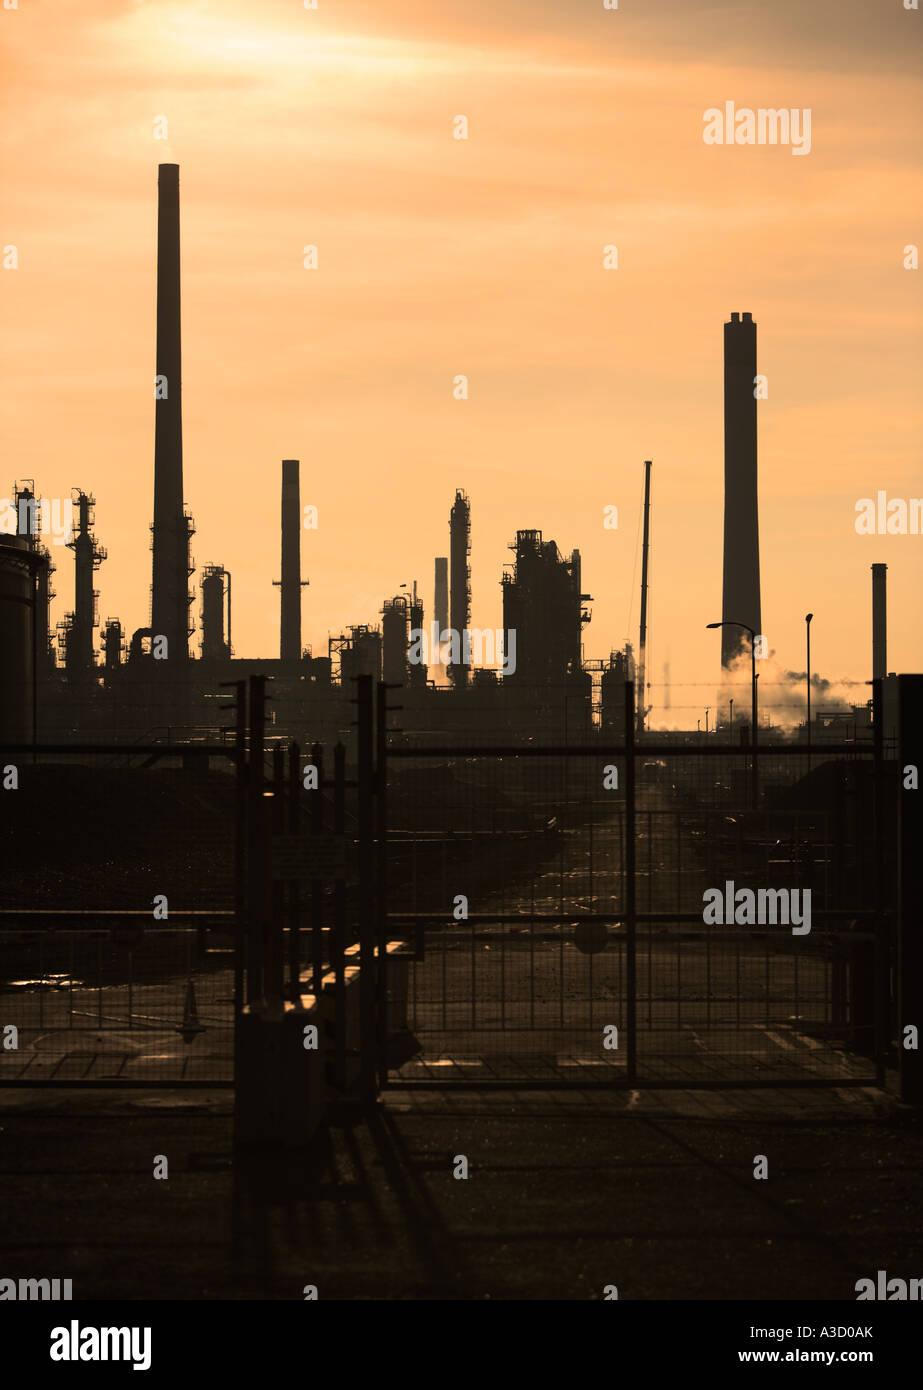 Oil refinery, England, UK - Stock Image